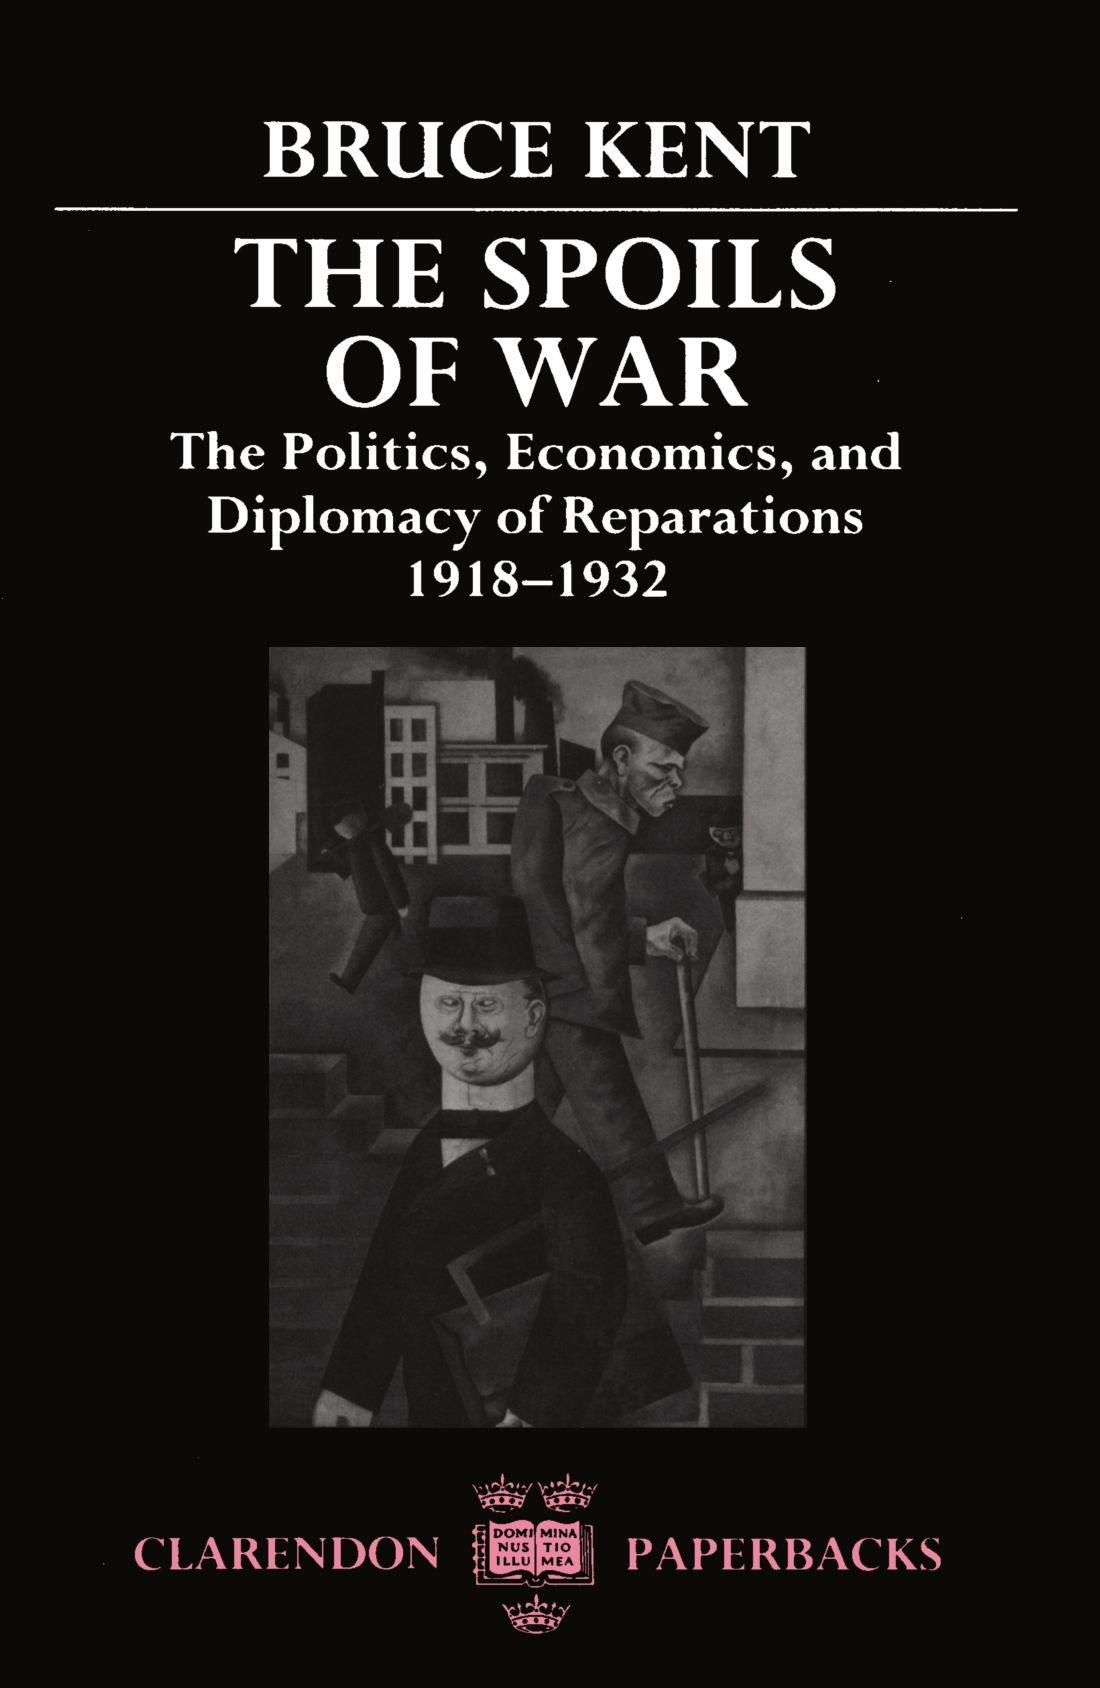 The Spoils of War: The Politics, Economics, and Diplomacy of Reparations 1918-1932 (Clarendon Paperbacks)